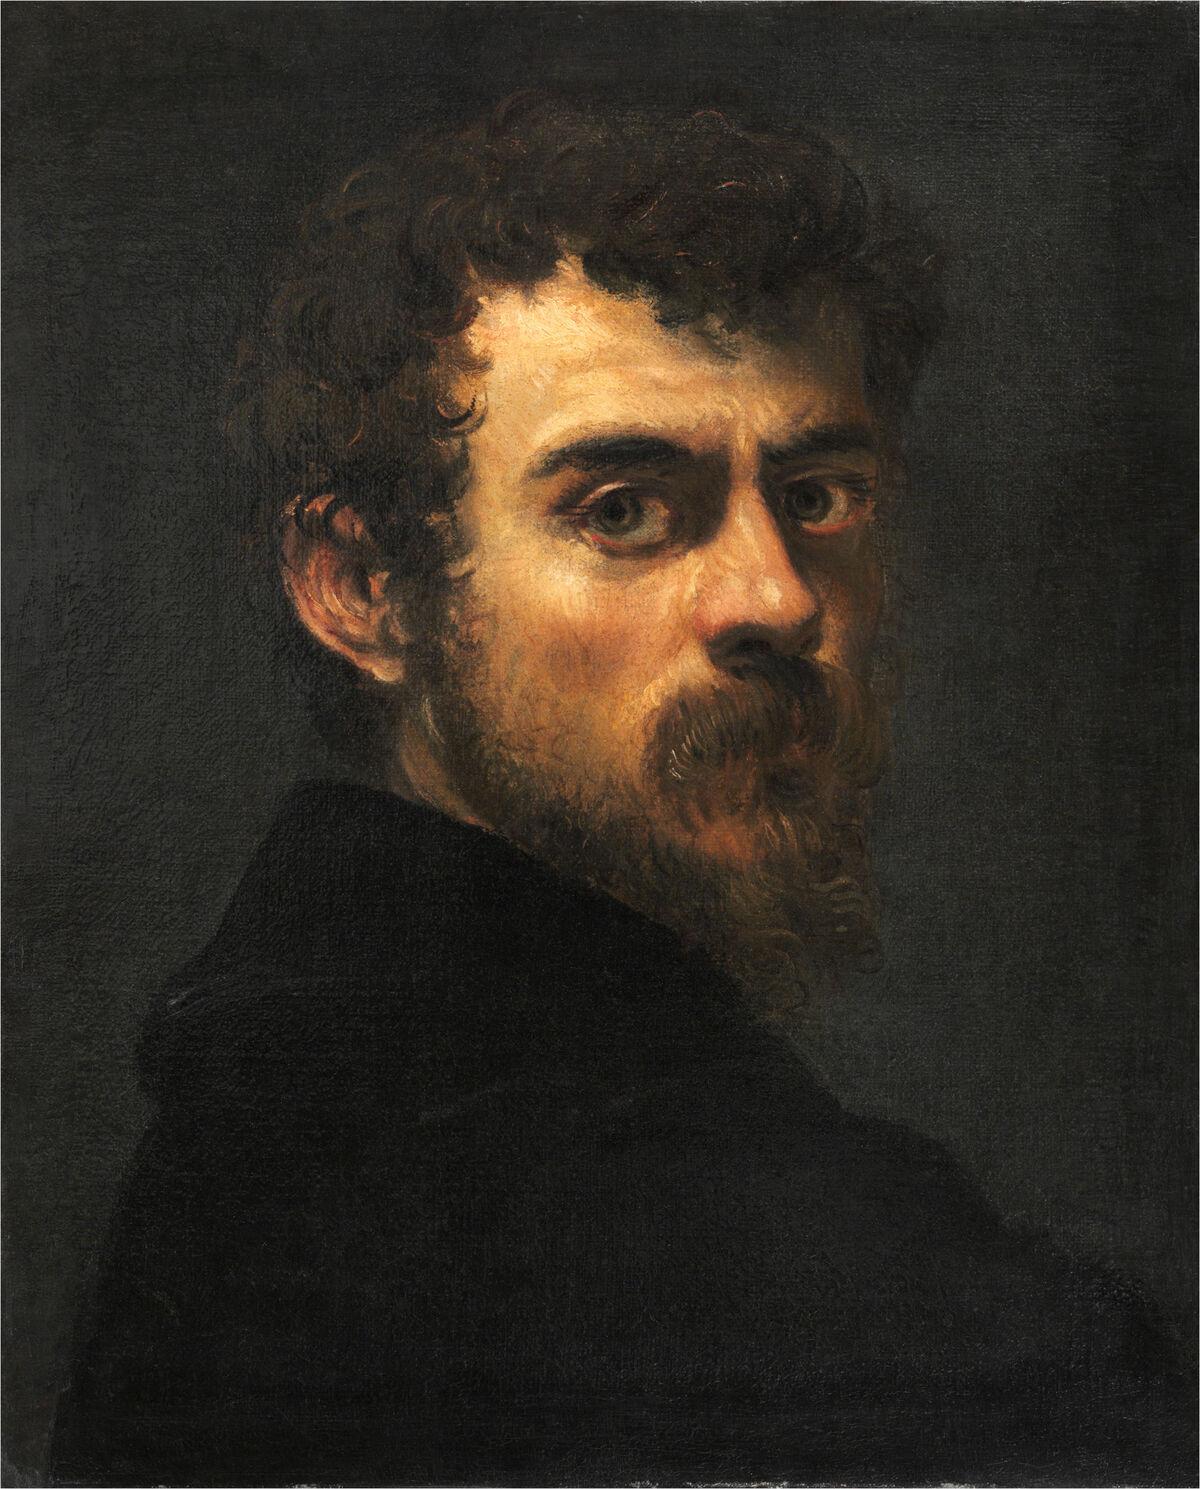 Jaco Tintoretto, Self-Portrait, c. 1546/48. Courtesy of The Philadelphia Museum of Art / Art Resource, New York.